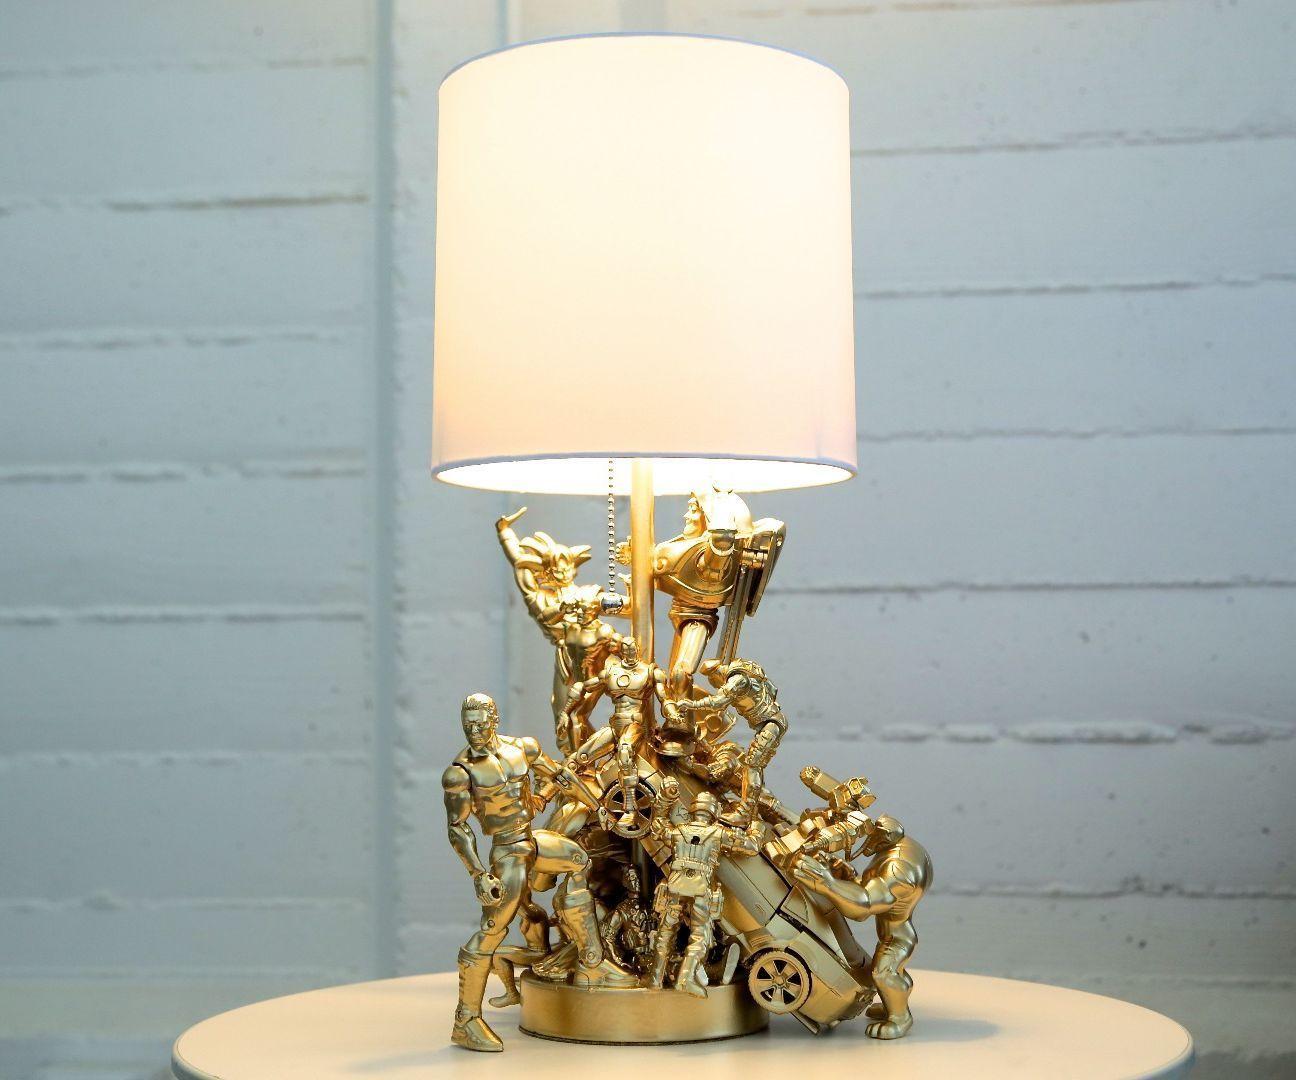 Action Figure Lamp Superhero Lamp Diy Lamp Diy Light Fixtures